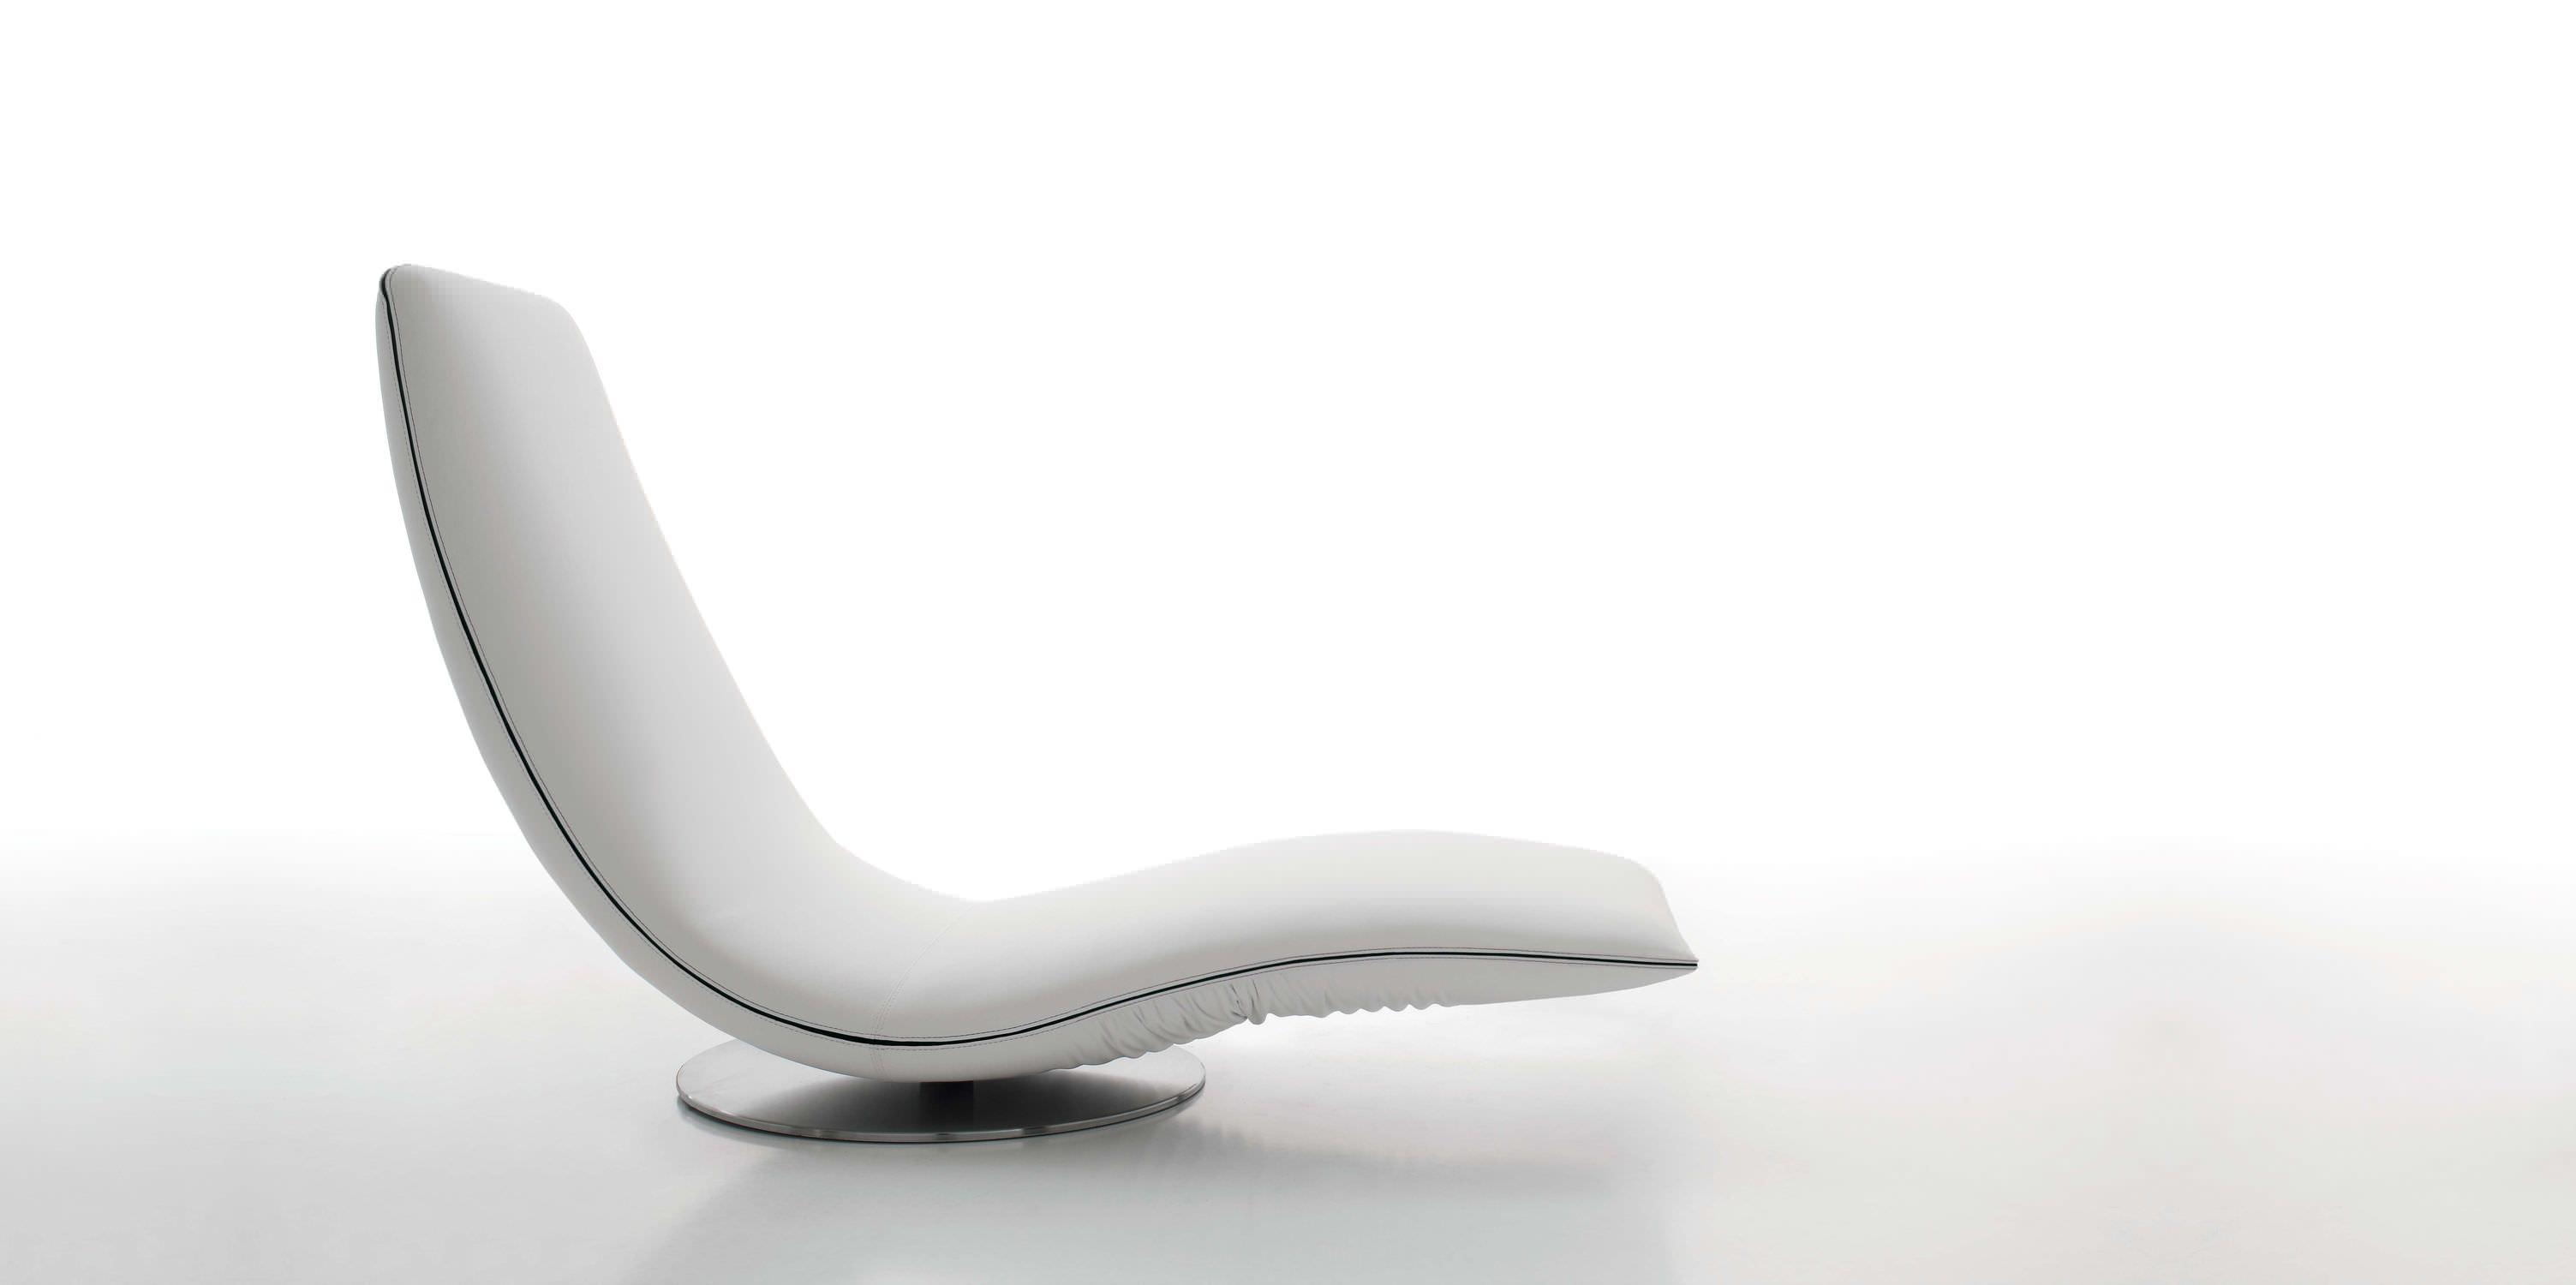 Pliante En Longue Design Chaise Tissu Cuir Original eEoQrdWCxB